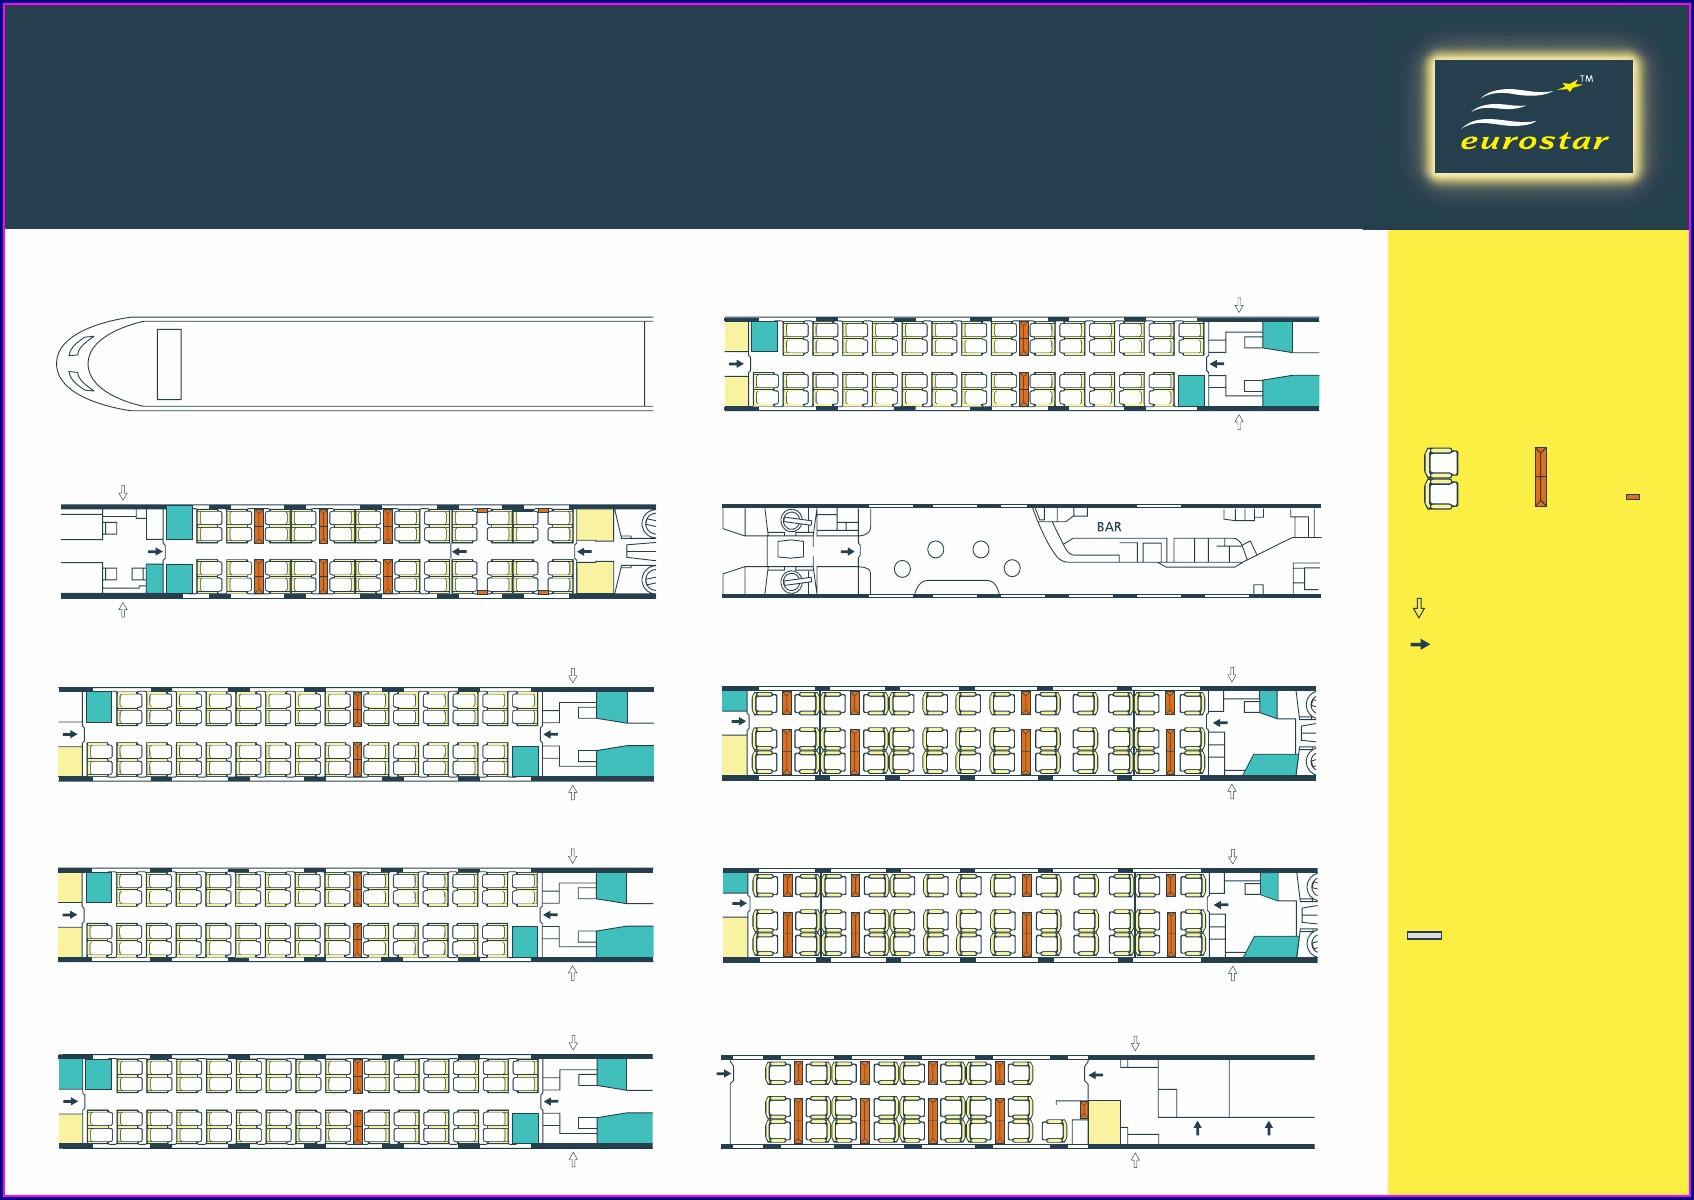 Eurostar Seat Map Coach 1